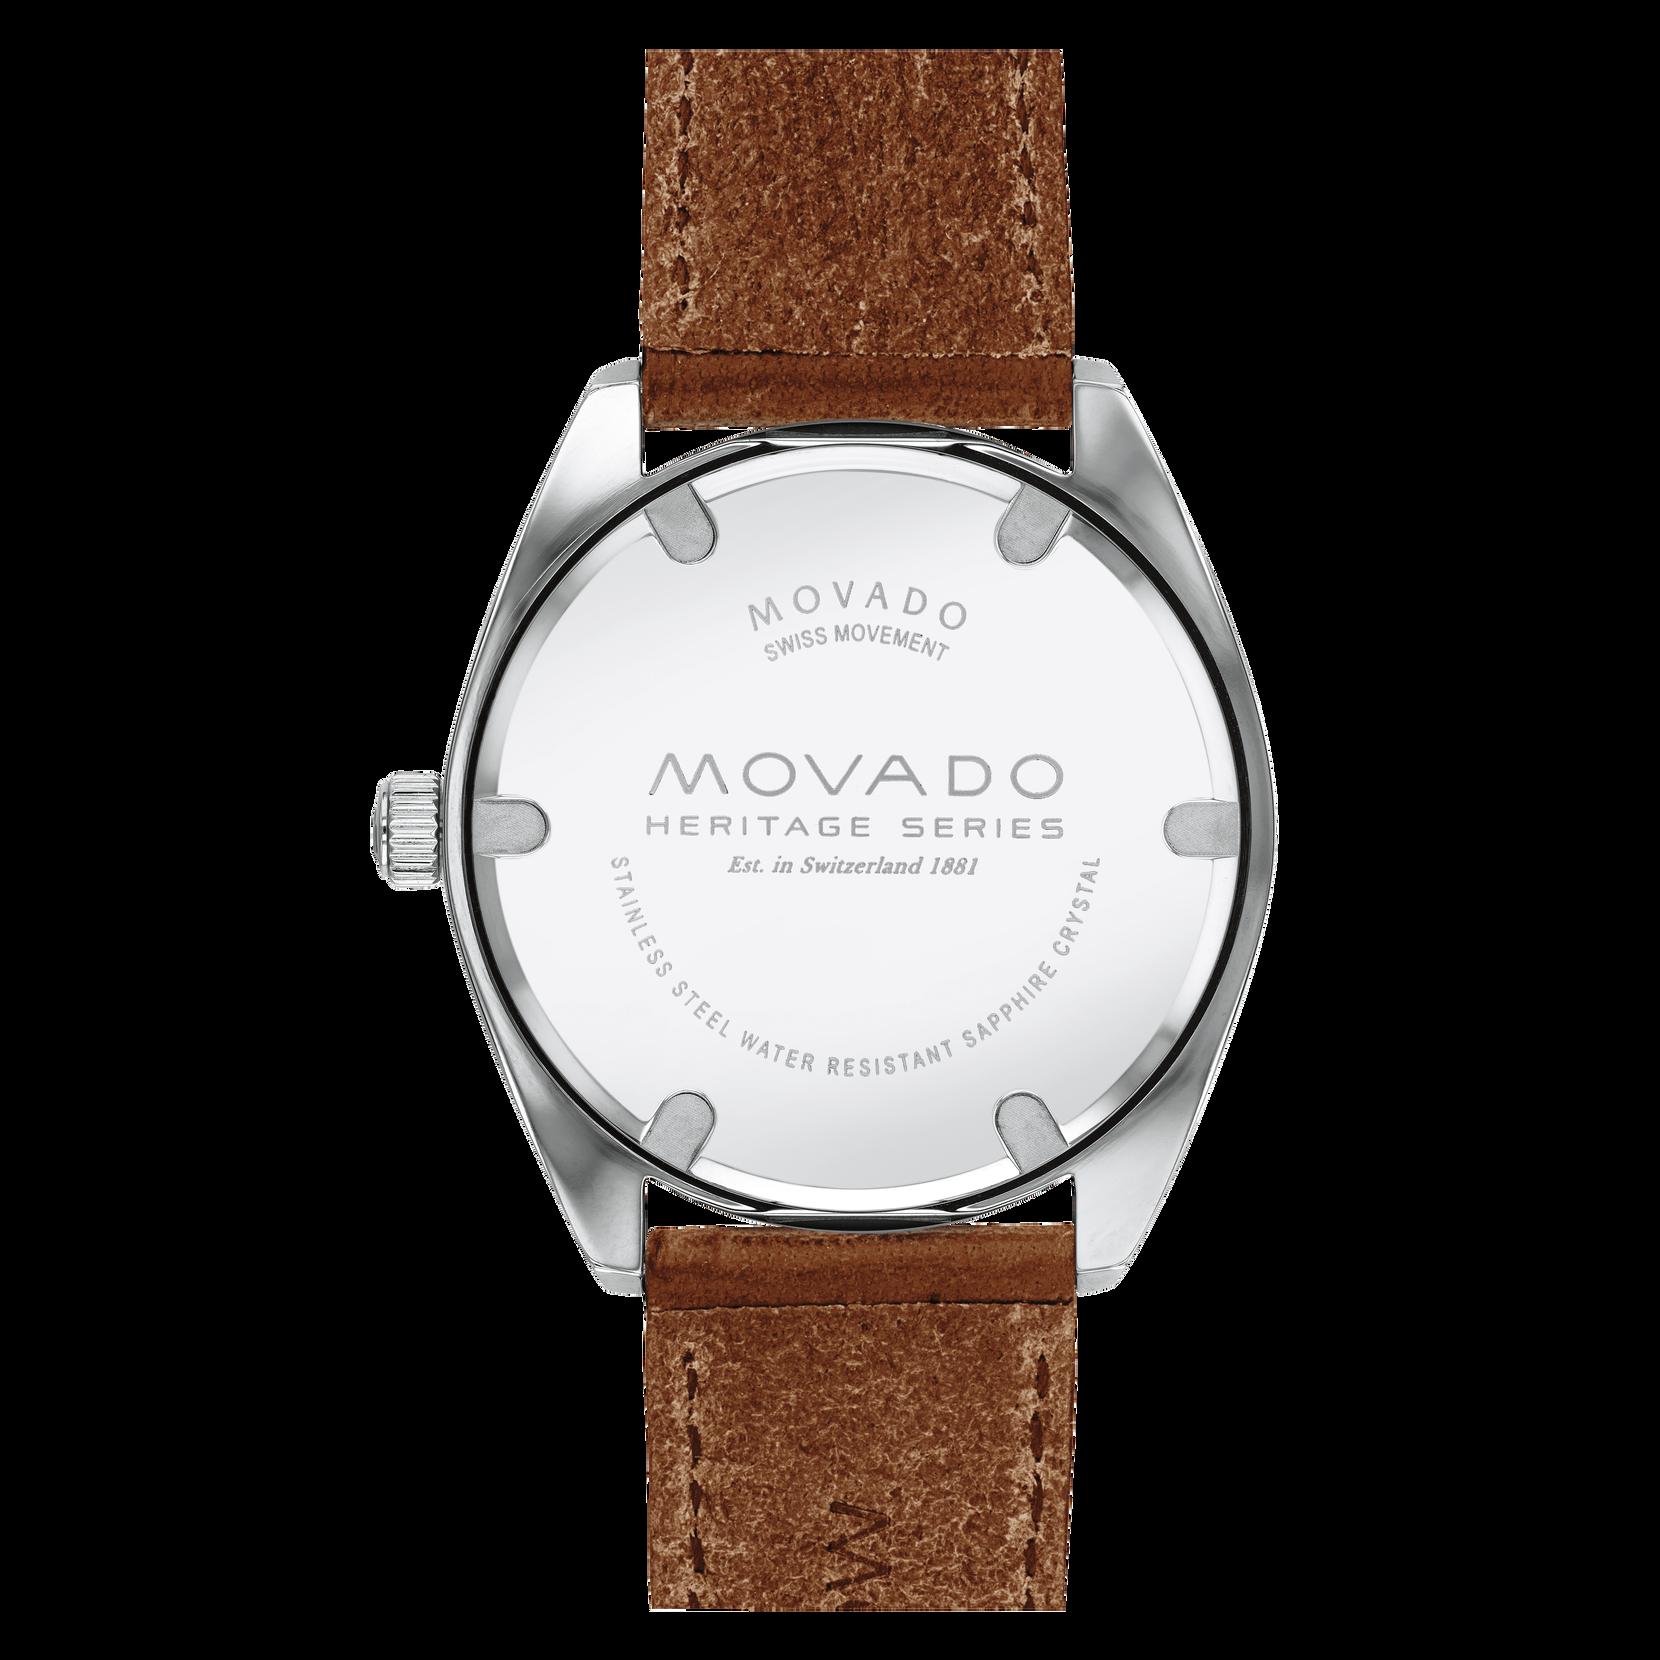 Movado Heritage Series